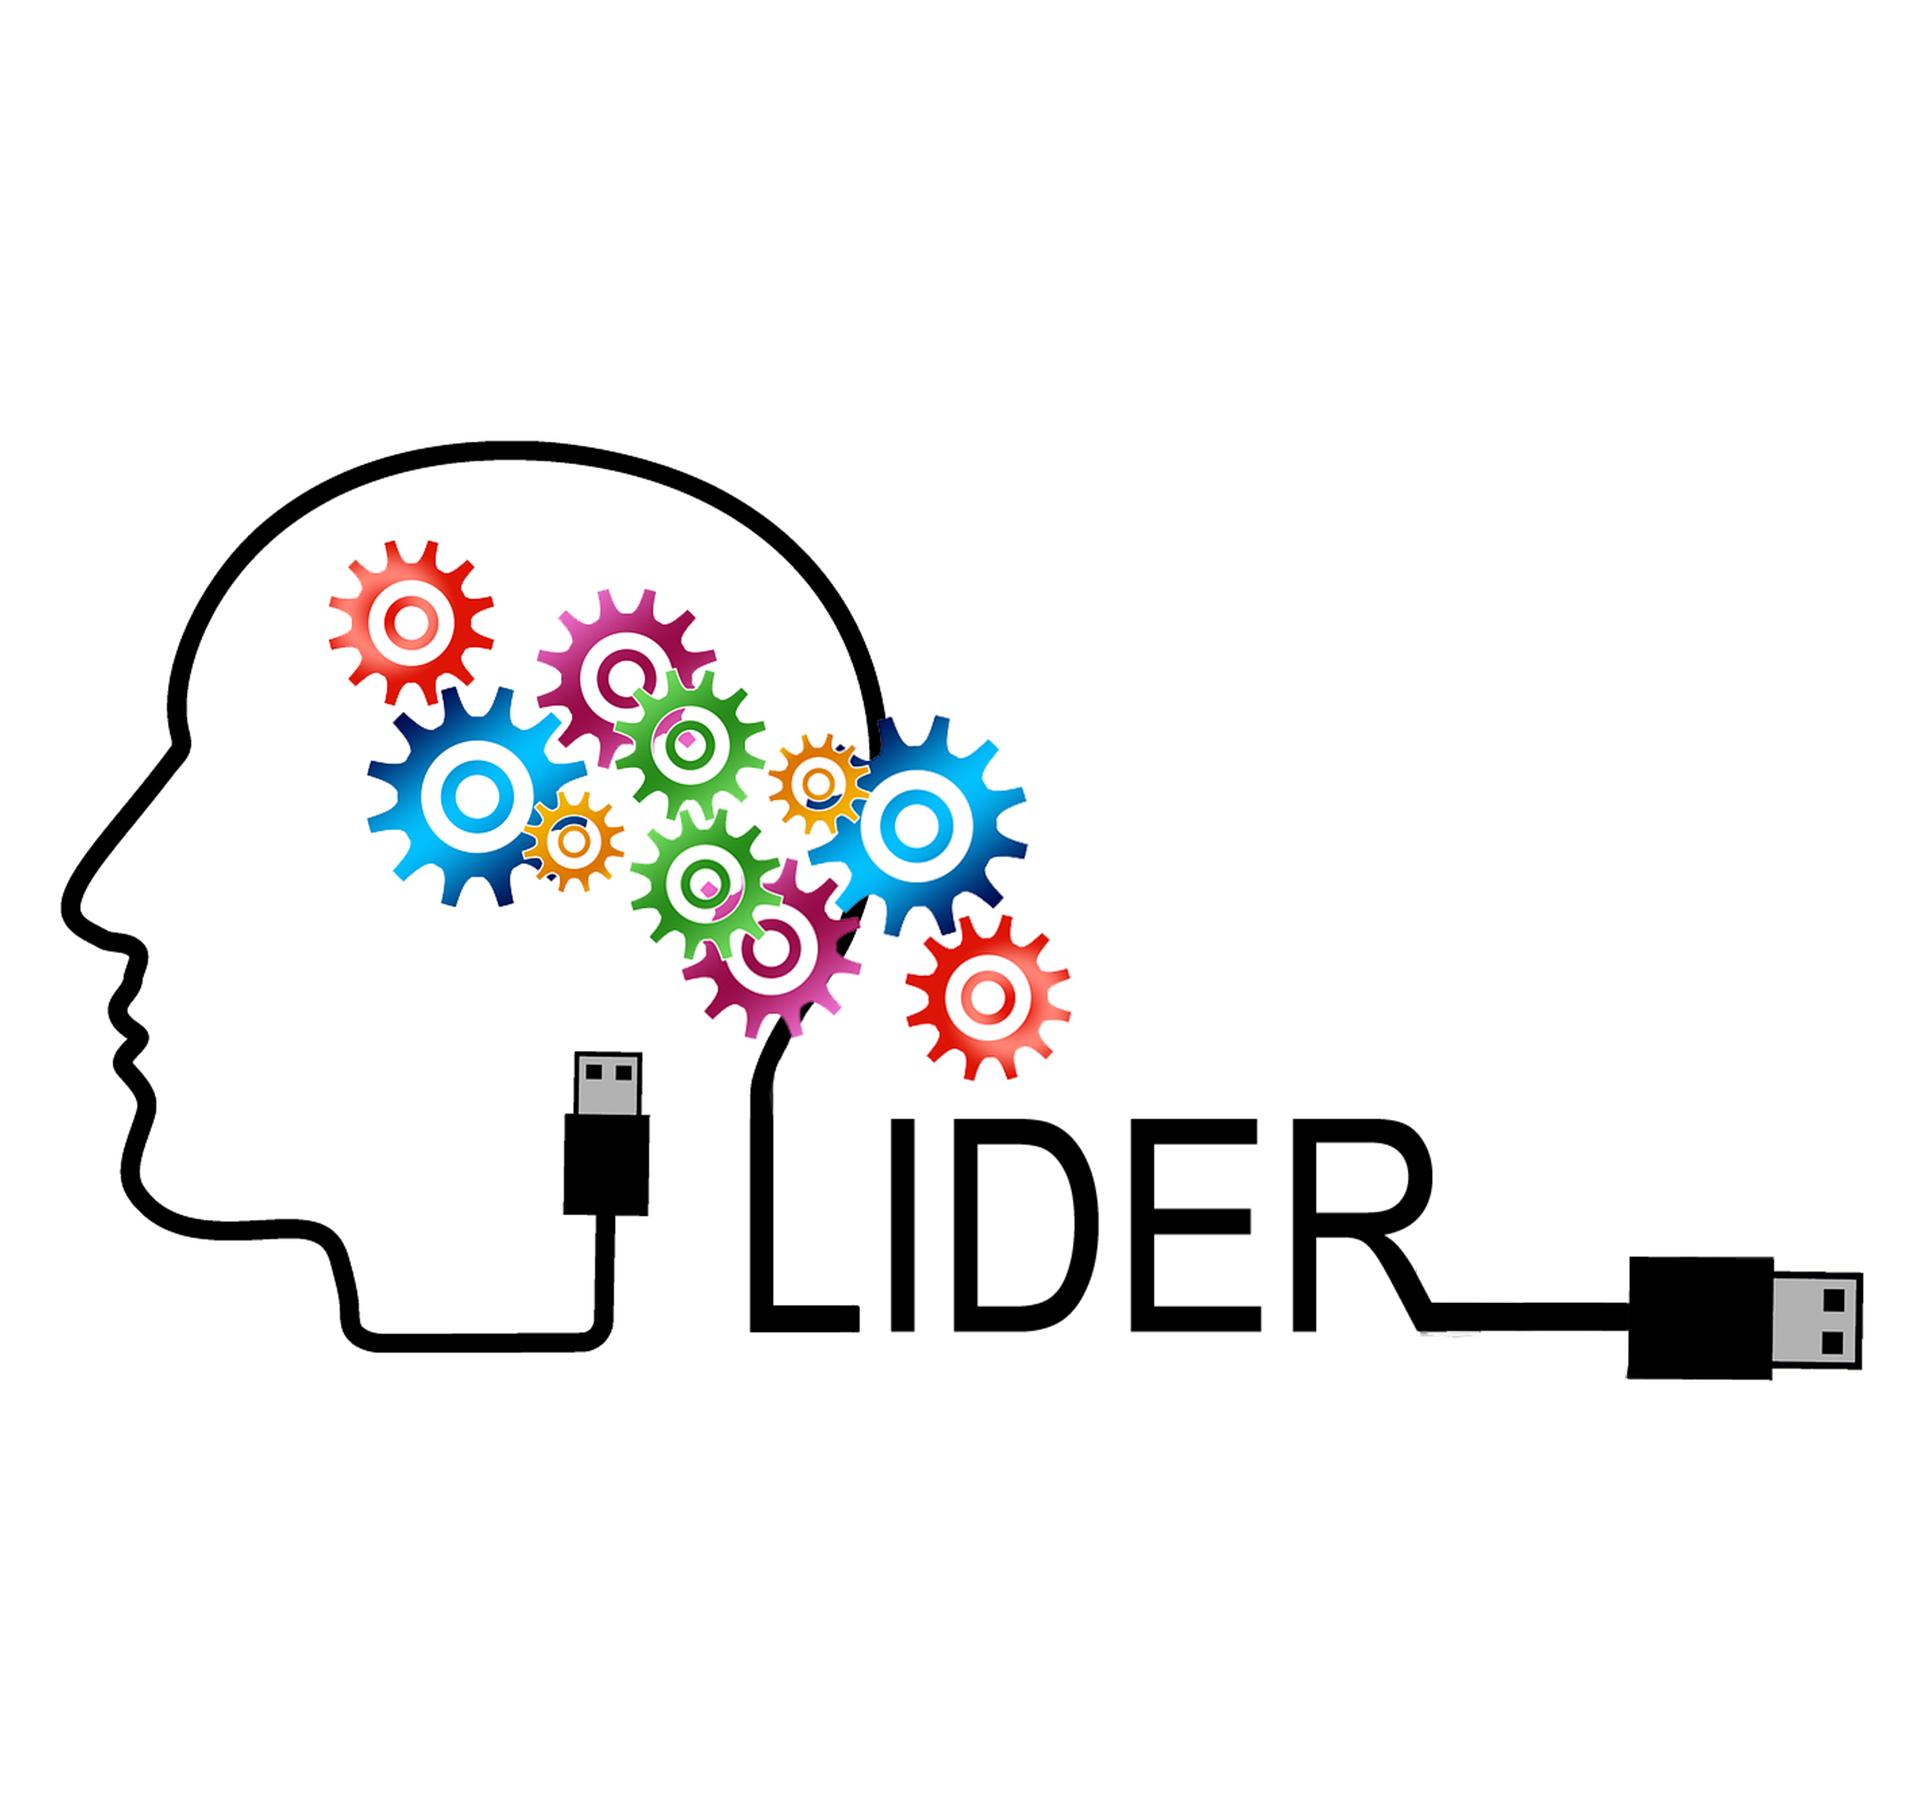 Badanie kompetencji lider 4.0